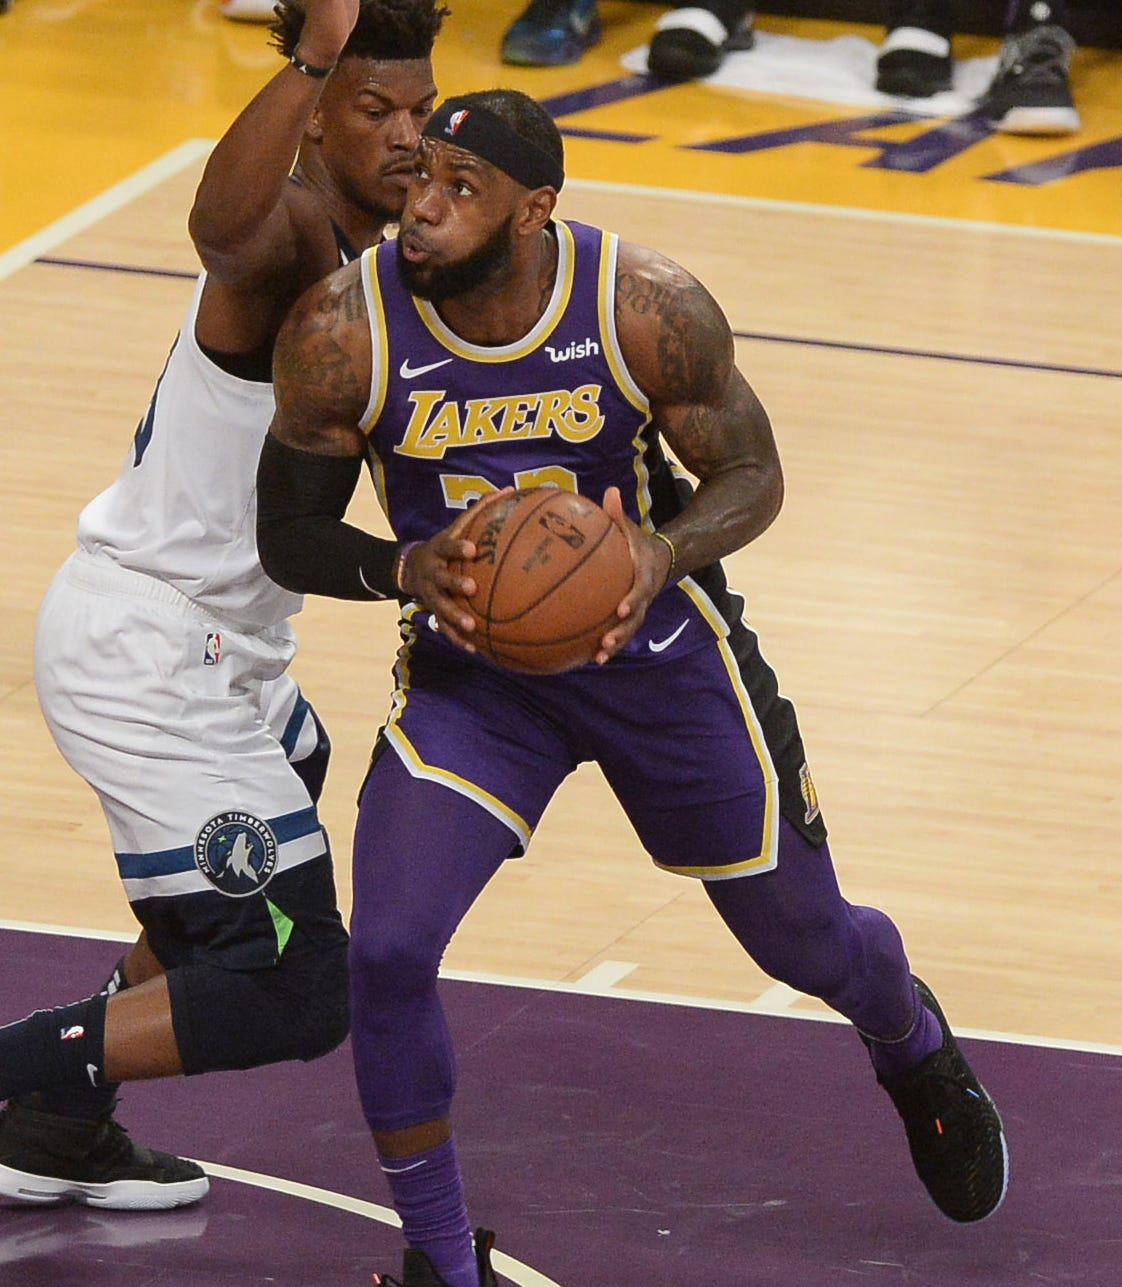 Usp Nba Minnesota Timberwolves At Los Angeles Lak S Bkn Lal Min Usa Ca